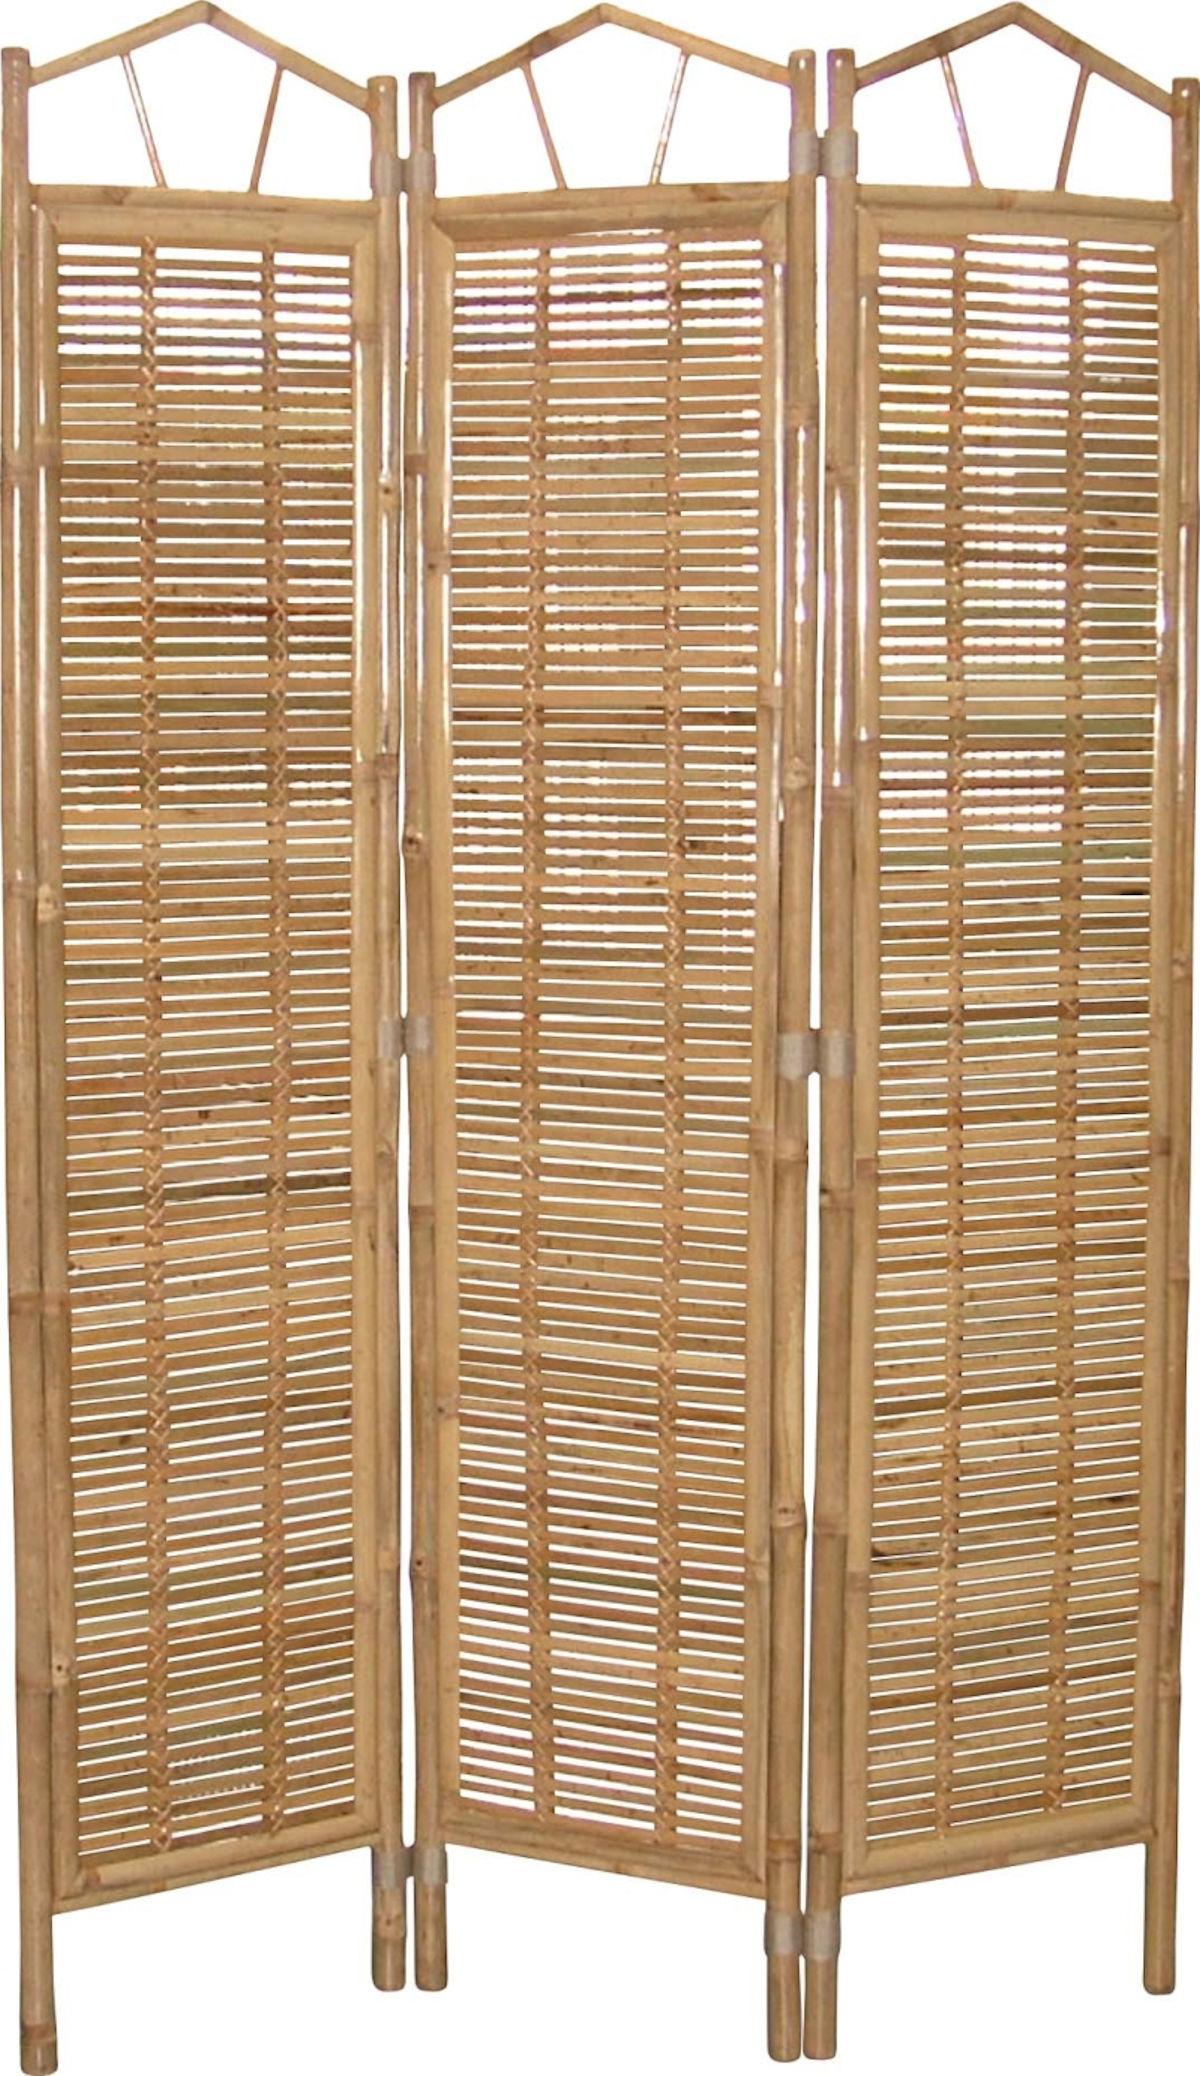 Full Size of Garten Paravent Bambus Bett Wohnzimmer Paravent Bambus